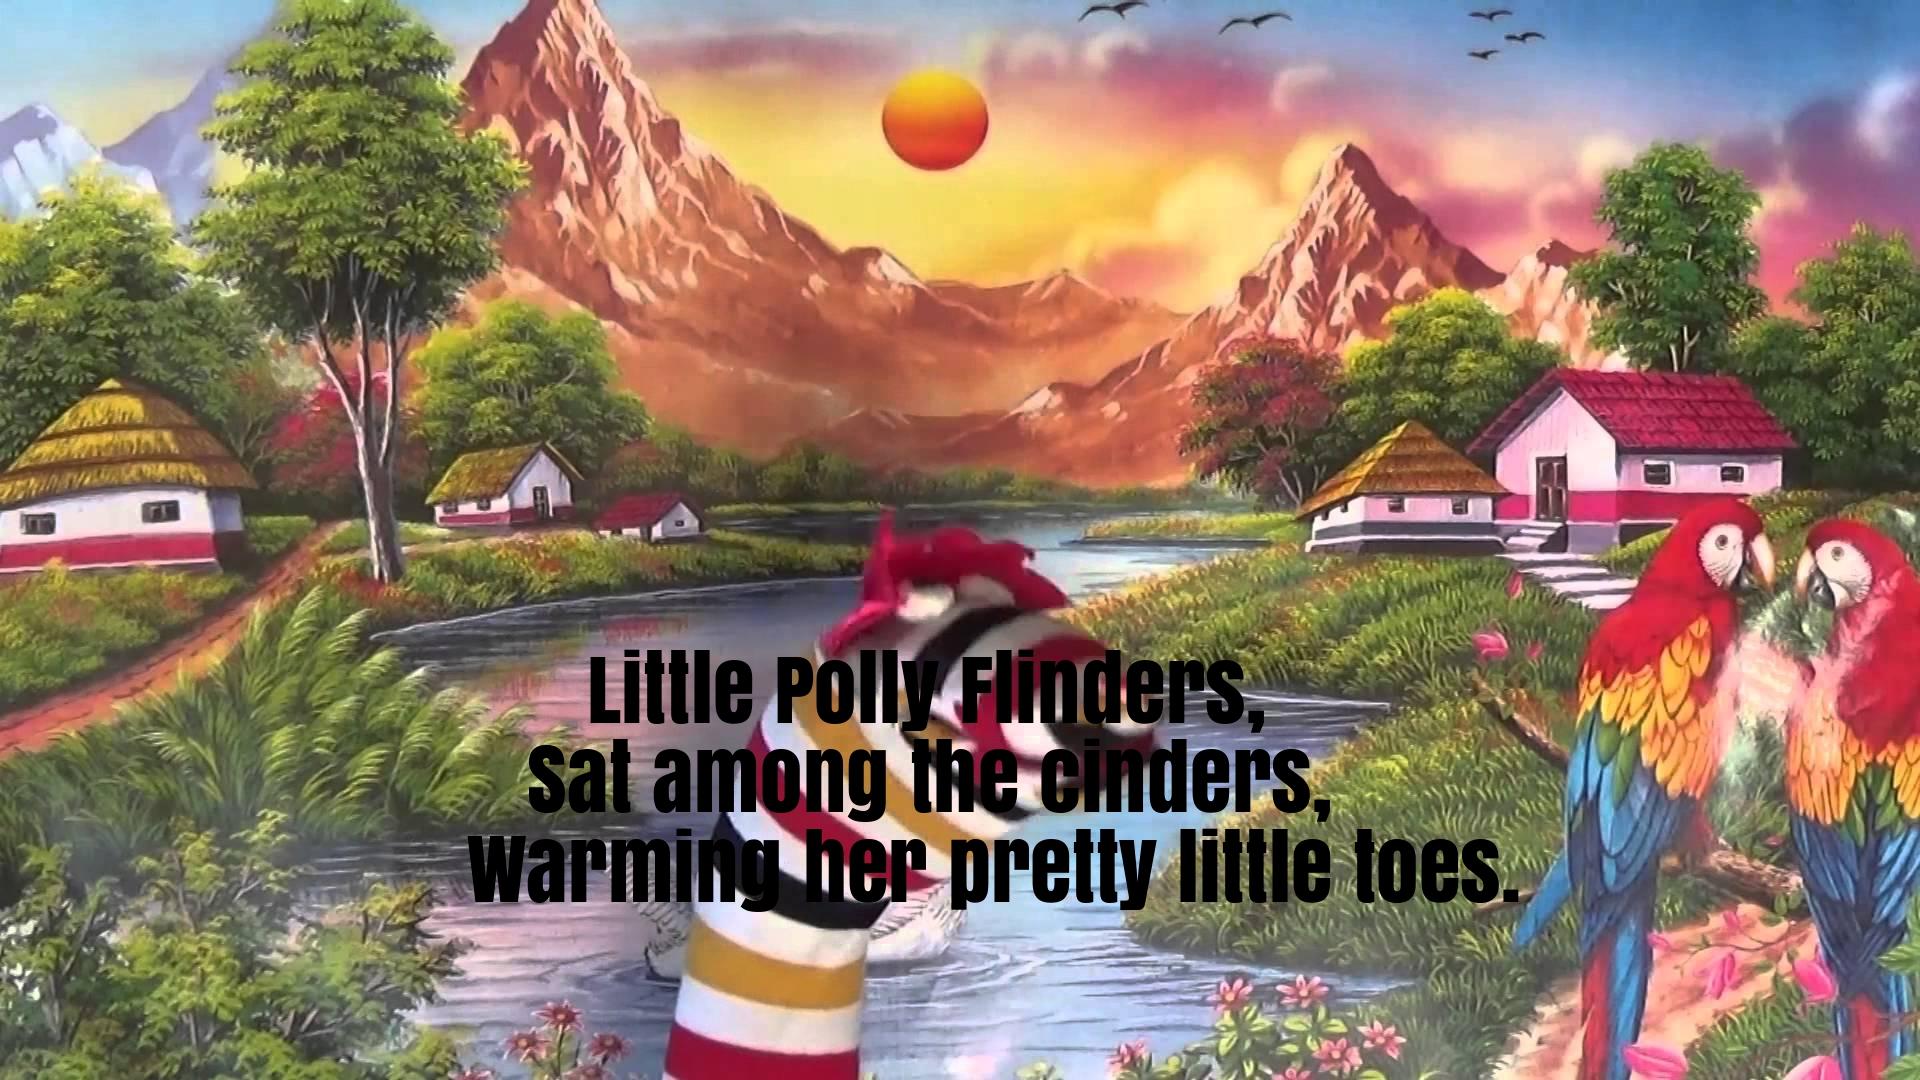 Little Polly Flinders Nursery Rhyme Lyrics